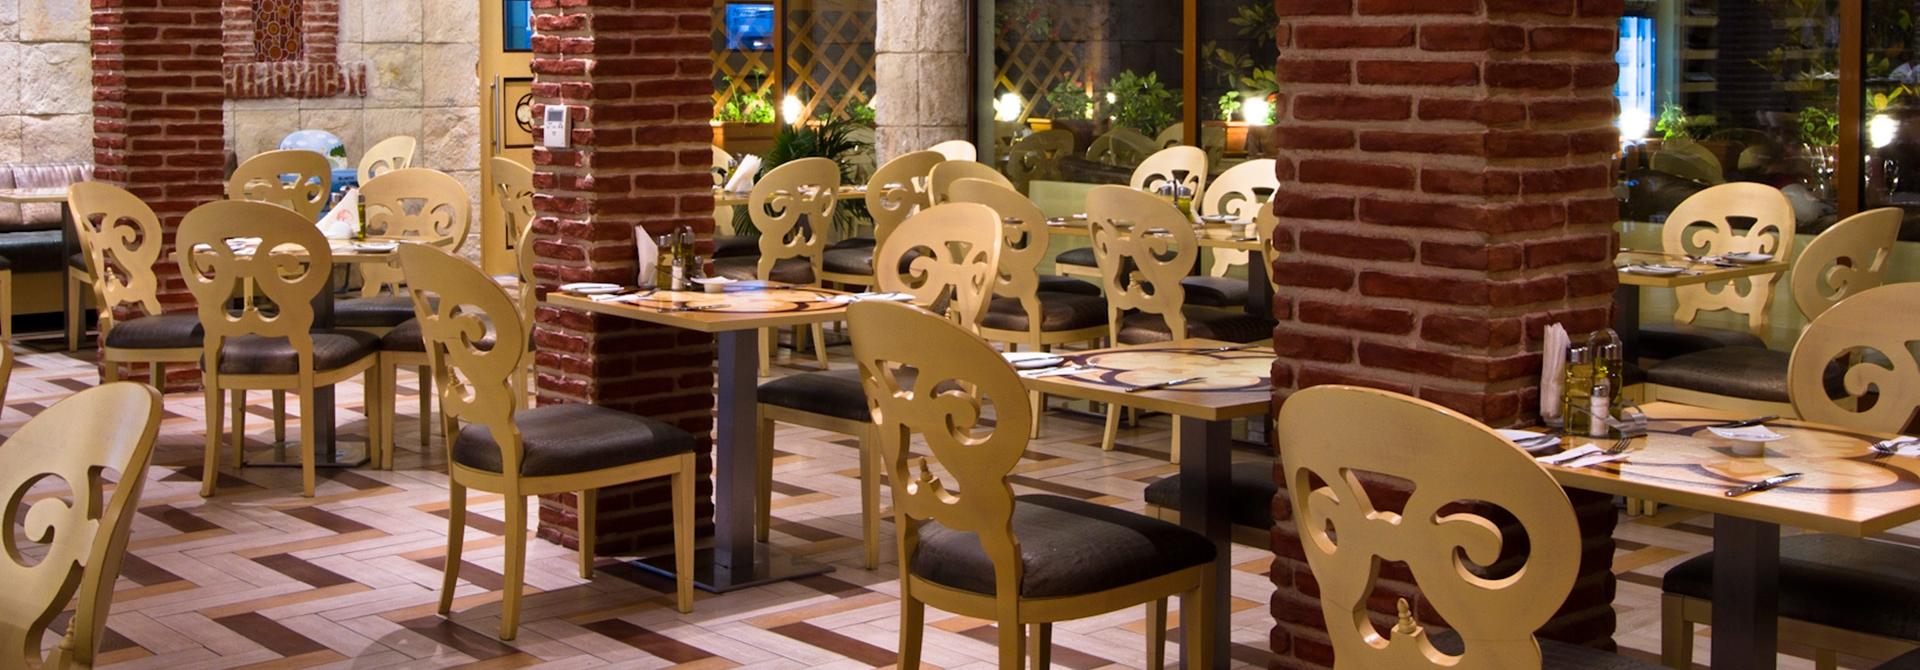 Хотел Райска градина Свети Влас